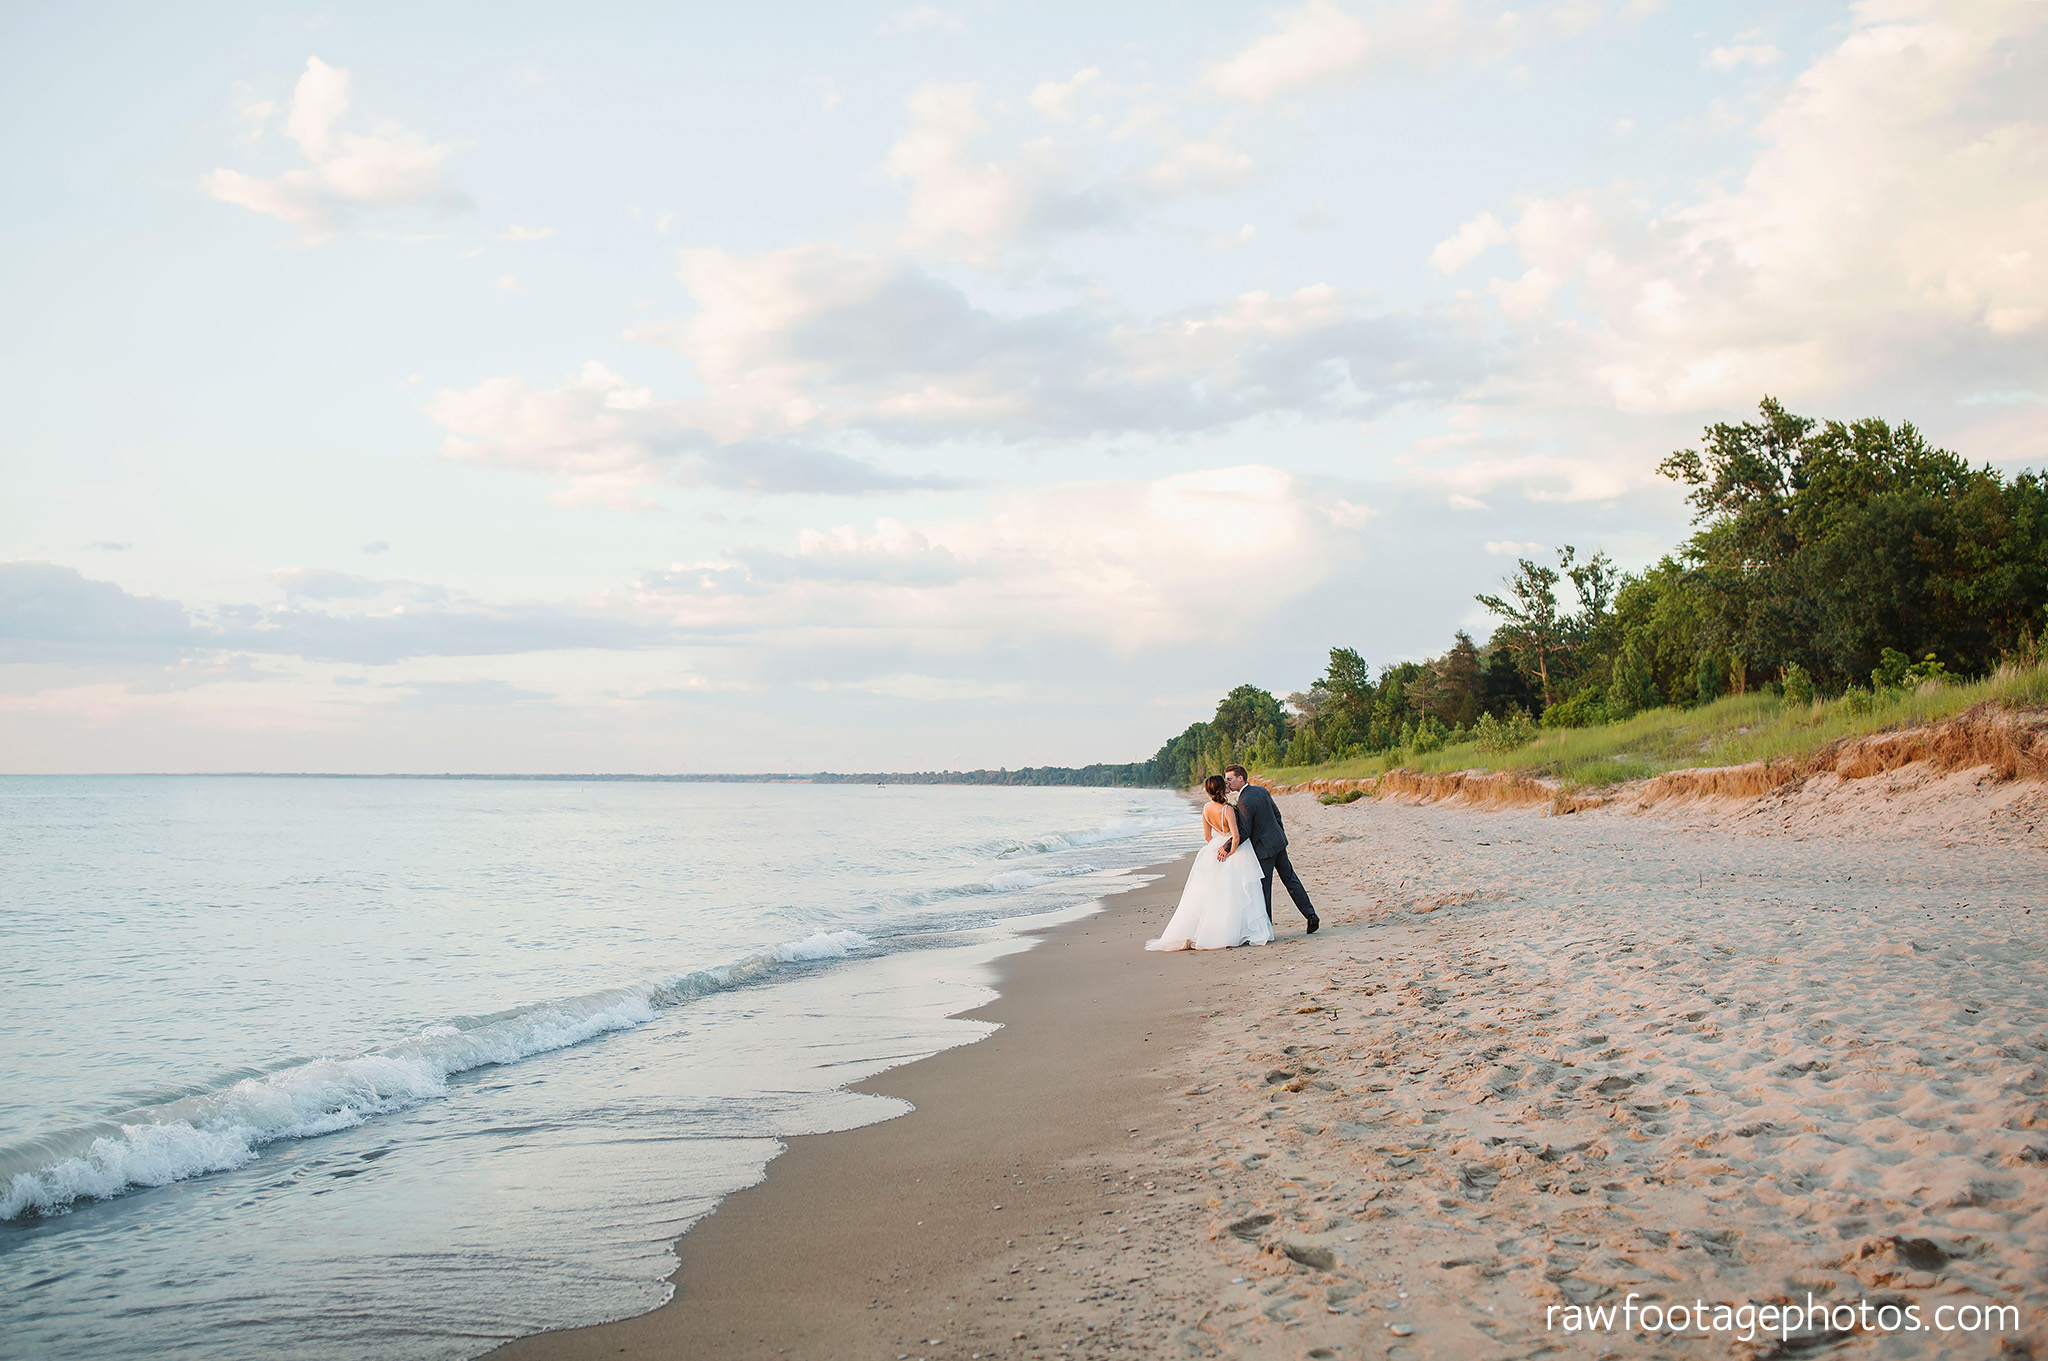 london_ontario_wedding_photographer-grand_bend_wedding_photographer-oakwood_resort_wedding-beach_wedding-sunset_wedding-raw_footage_photography067.jpg